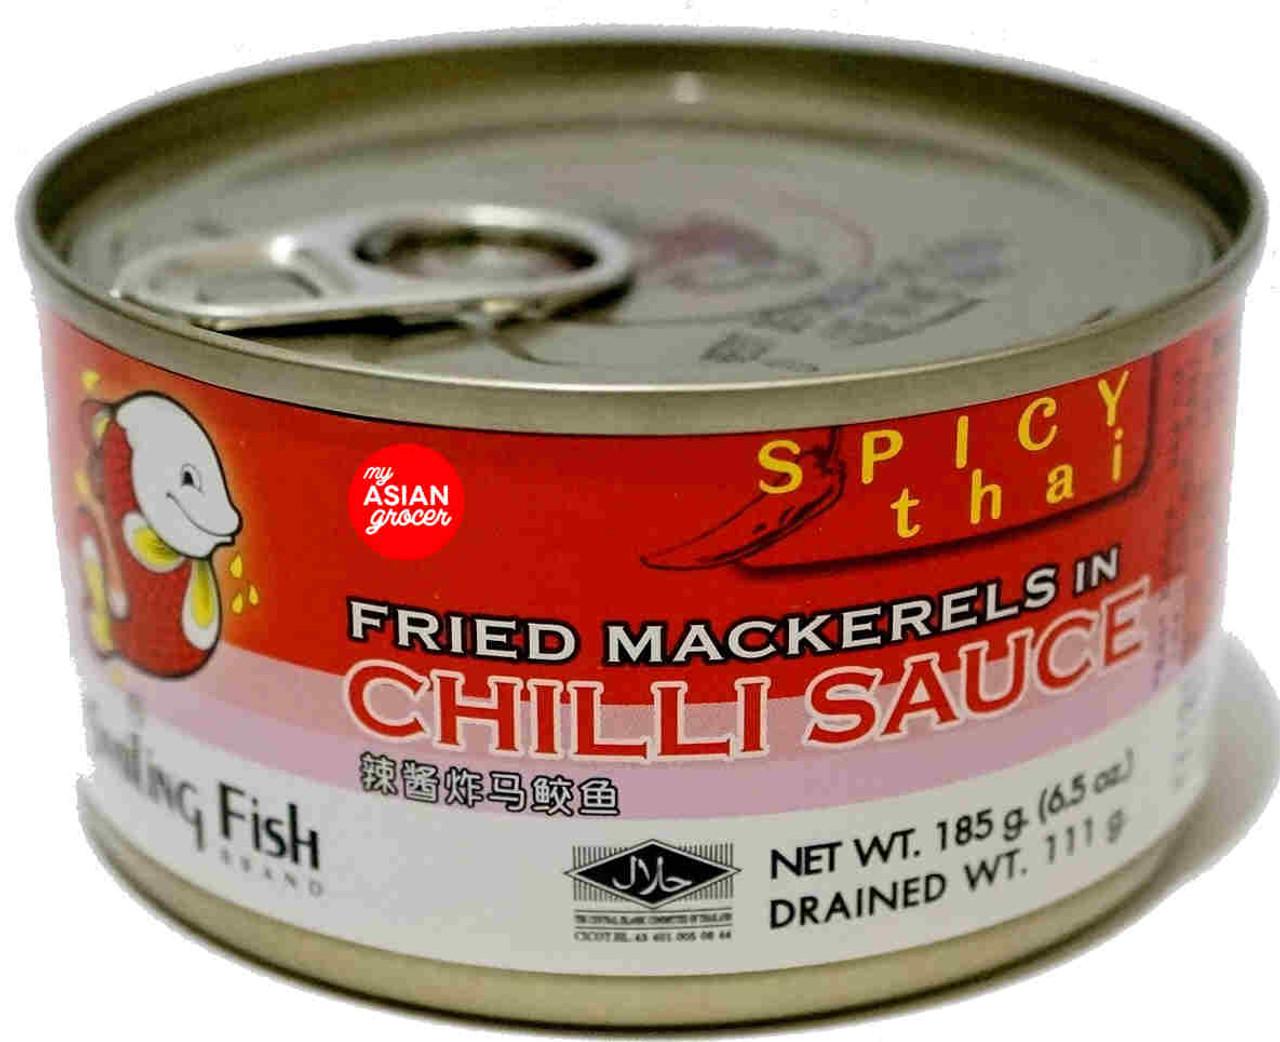 Smiling Fish Brand Fried Mackerels in Chilli Sauce 185g